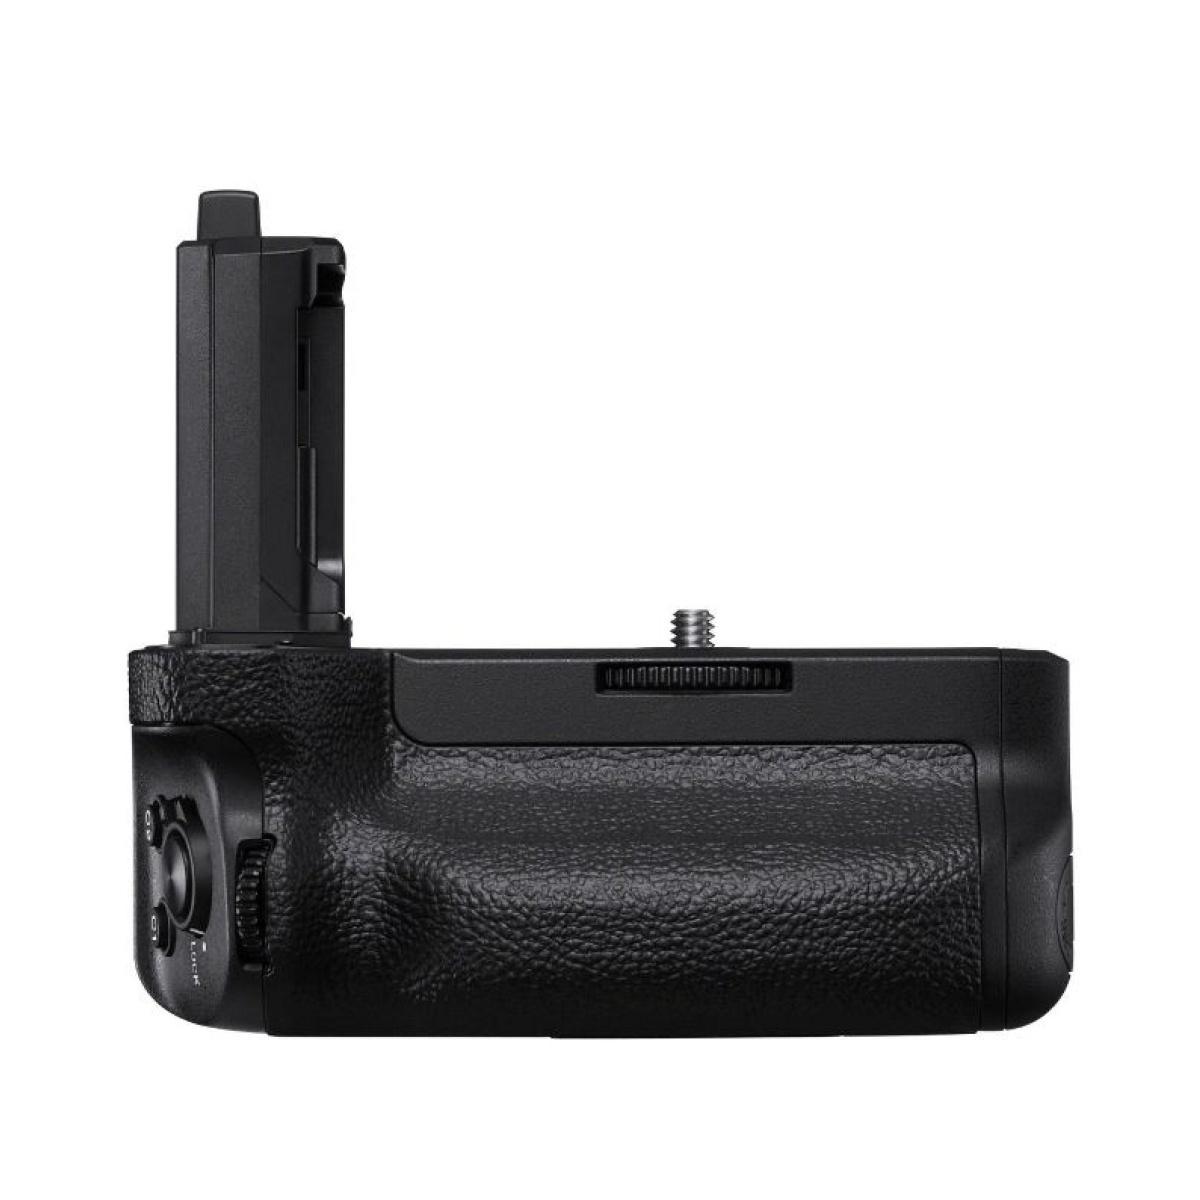 Sony VG-C4 EM Batteriegriff für 7R IV, 7 S III, Alpha 1